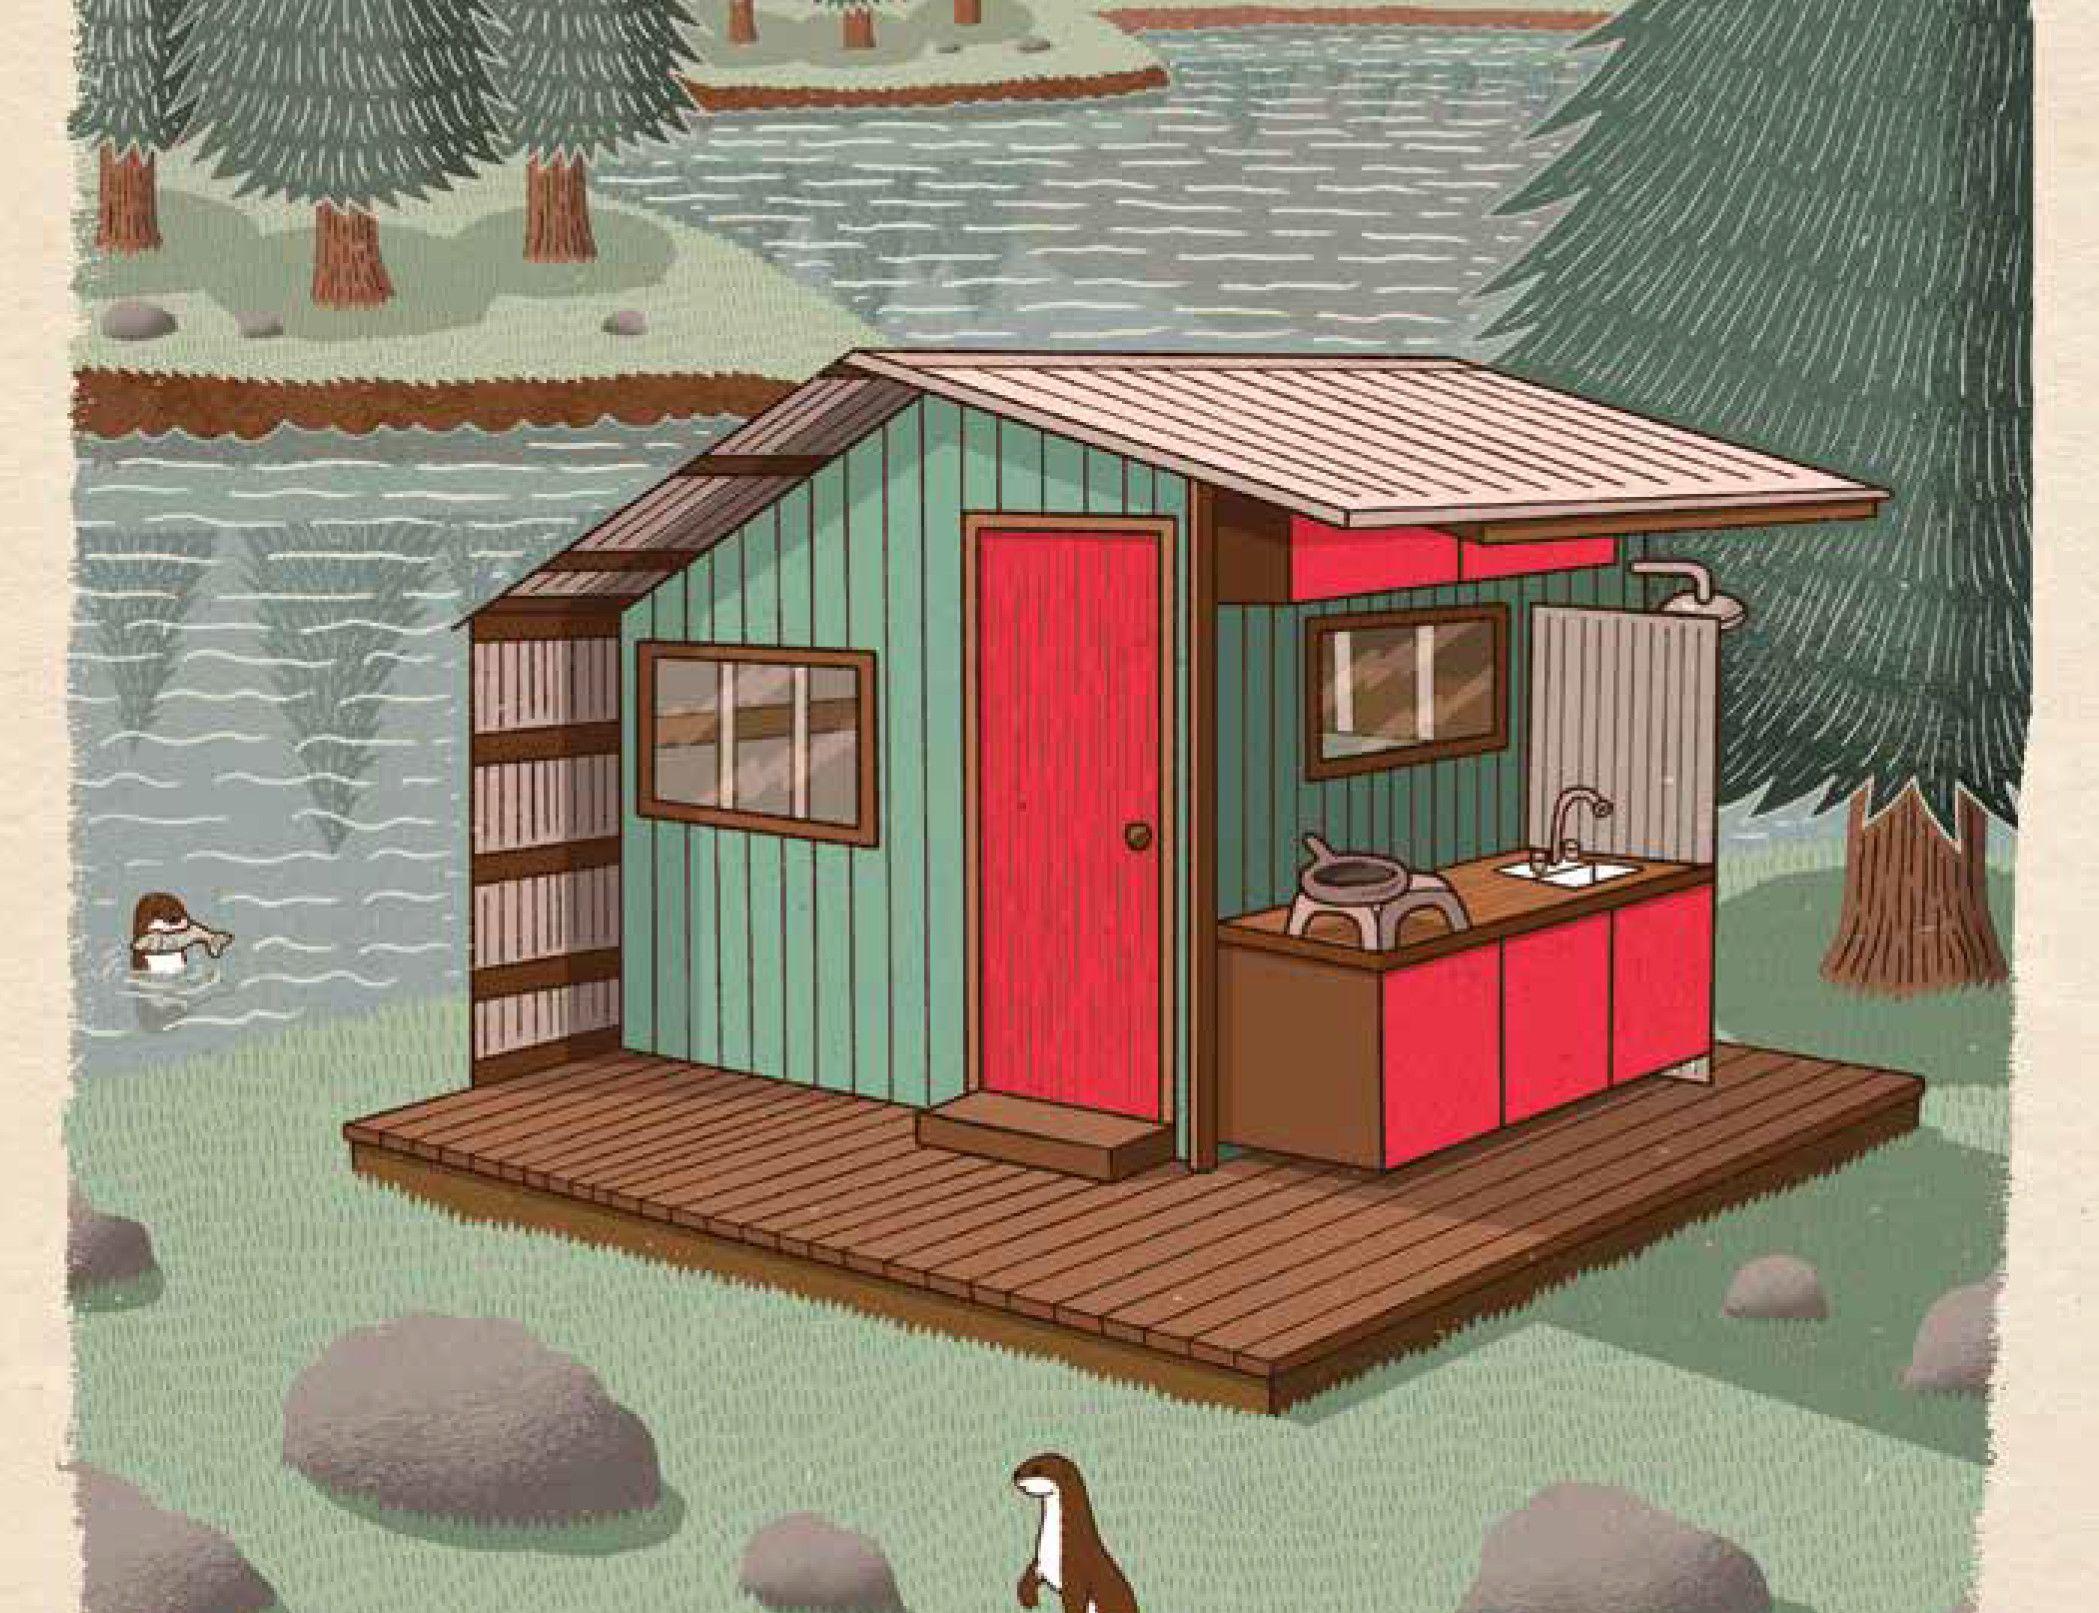 In his Microshelters book, Derek Deek Diedricksen profiles 59 adorable, imaginative structures perfect for a backyard project.